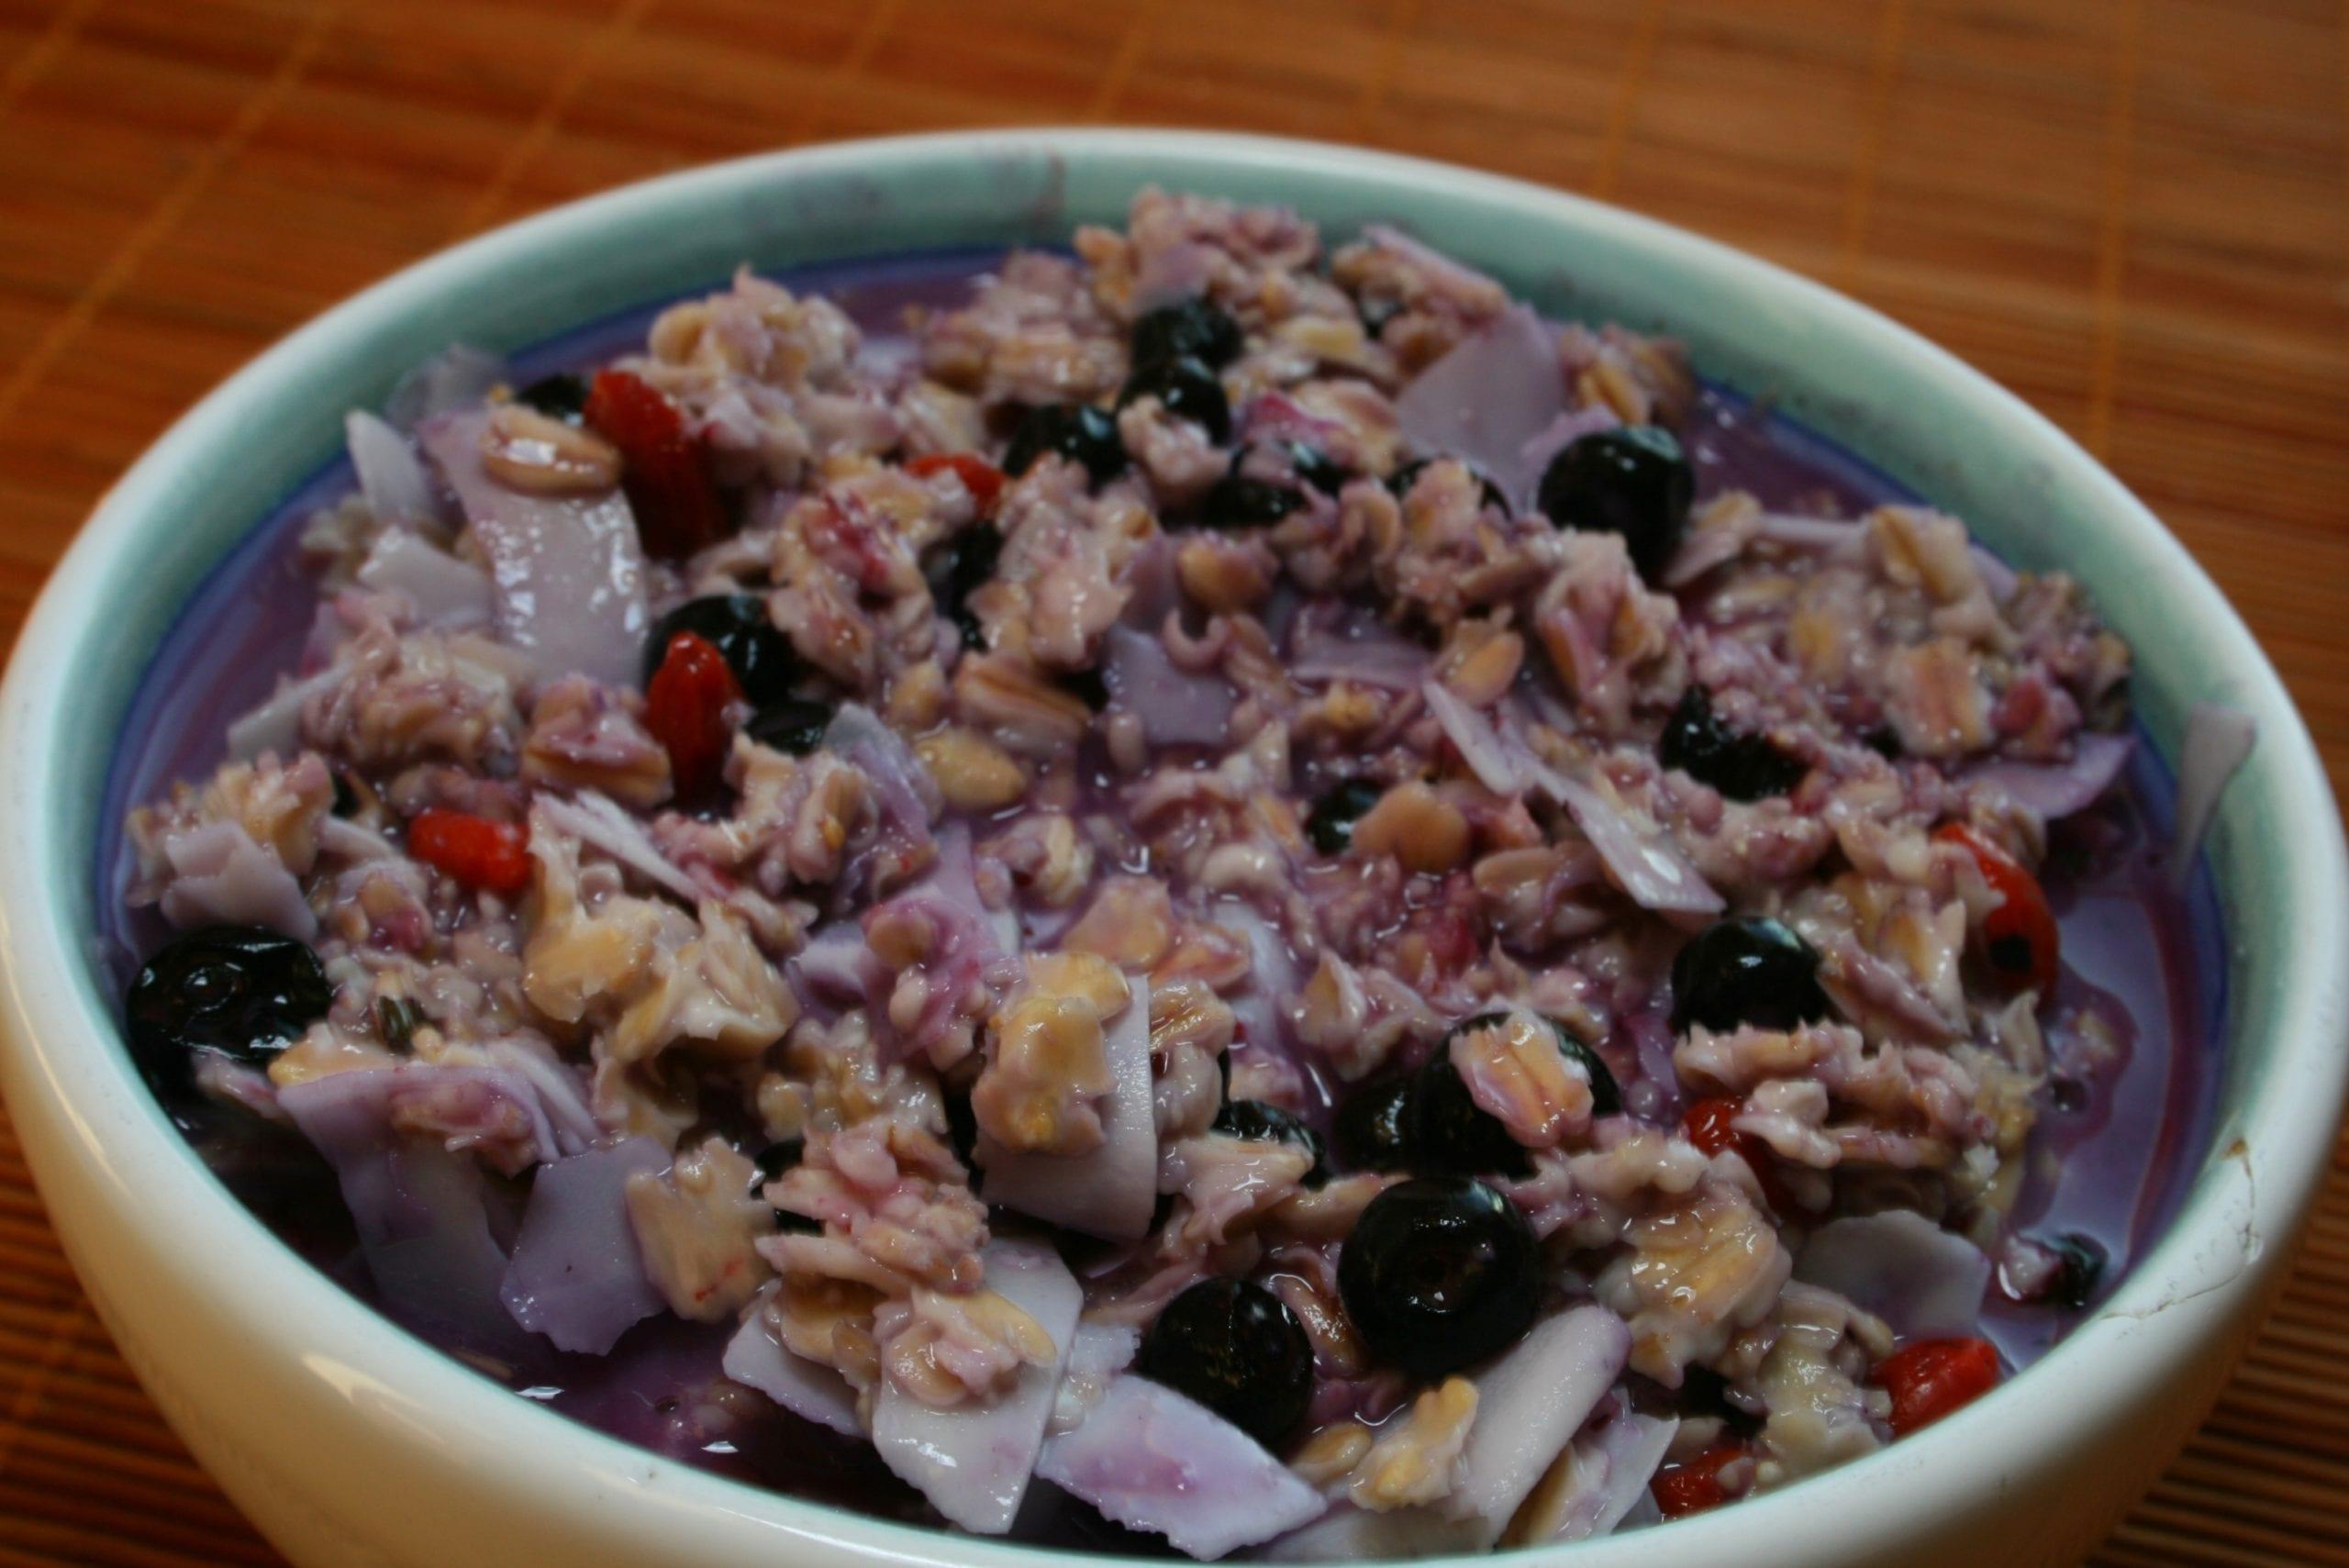 Oatmeal with goji berries blueberries and shredded coconut - Kaerapuder mustikatega 002